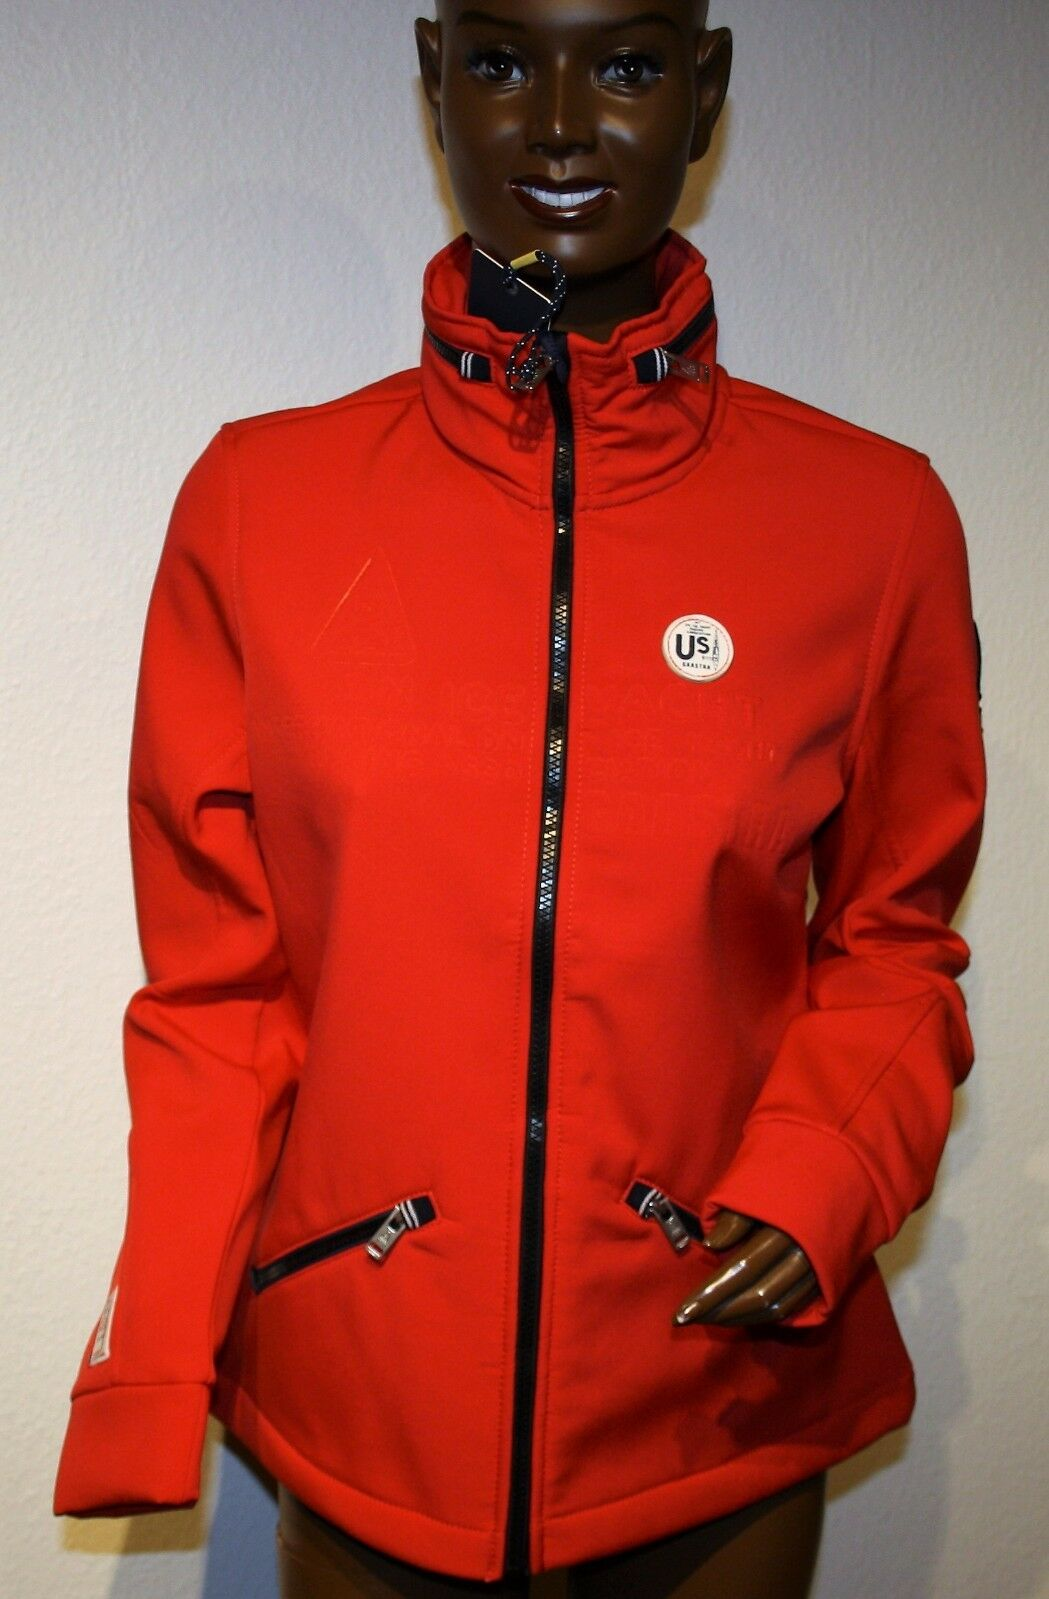 Neu aktuelle Gaastra Frühjahrs Softshelljacke  Jacke, Gr. XL, rot, super